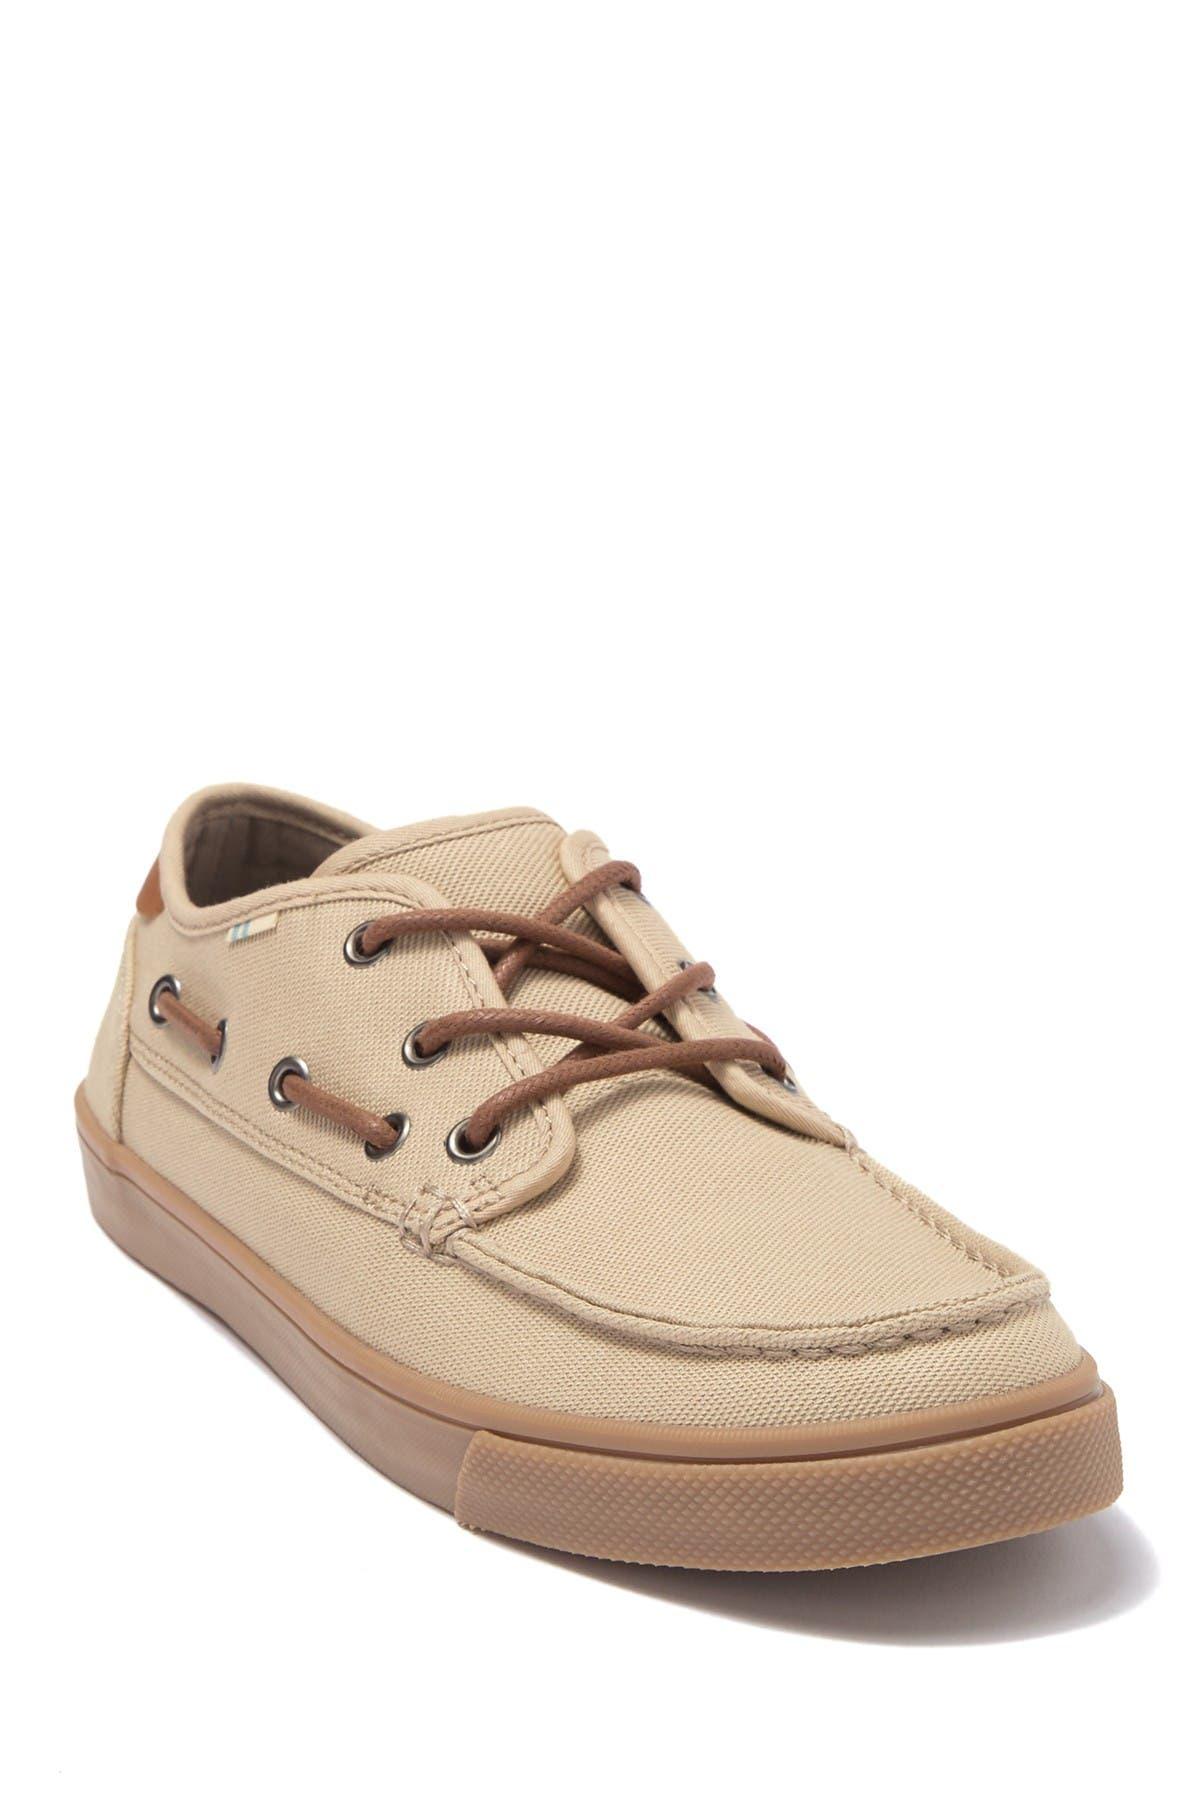 Image of TOMS Dorado Boat Shoe